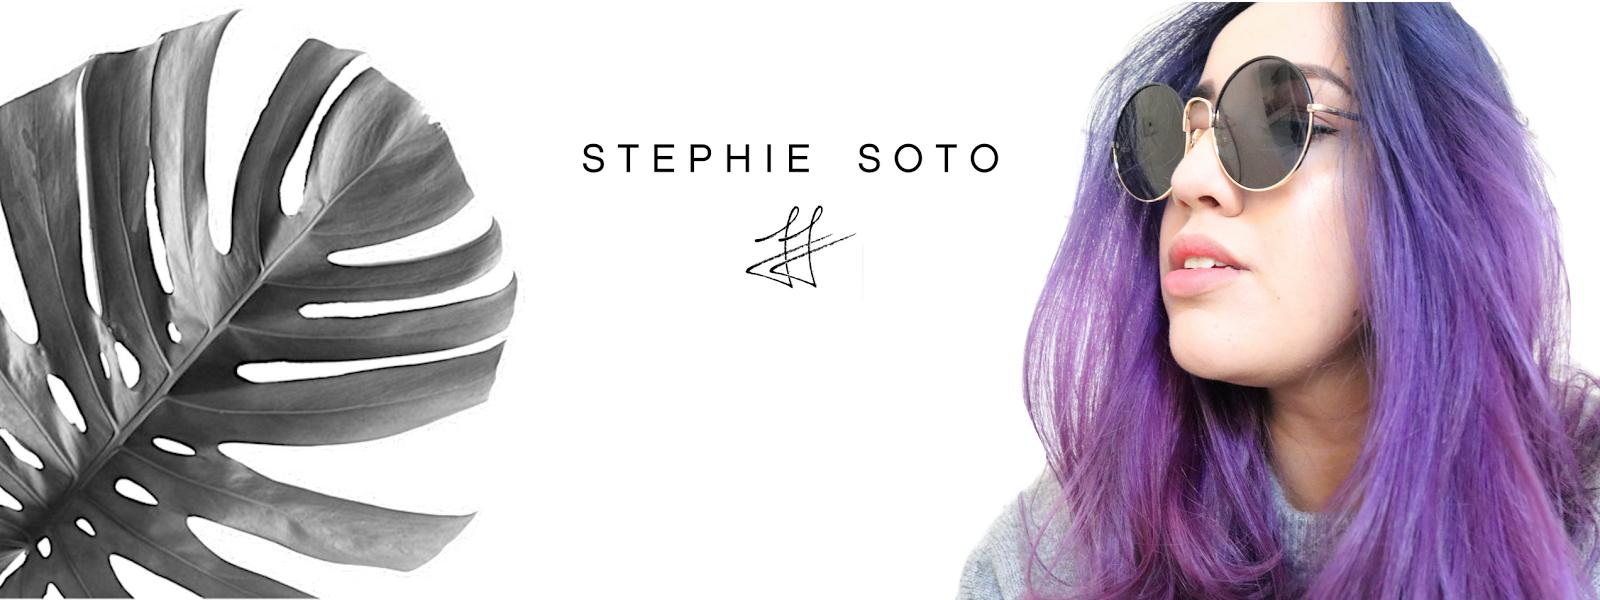 A PENTATONIX CHRISTMAS TEASER REACTION | Stephie Soto | Stephie Soto